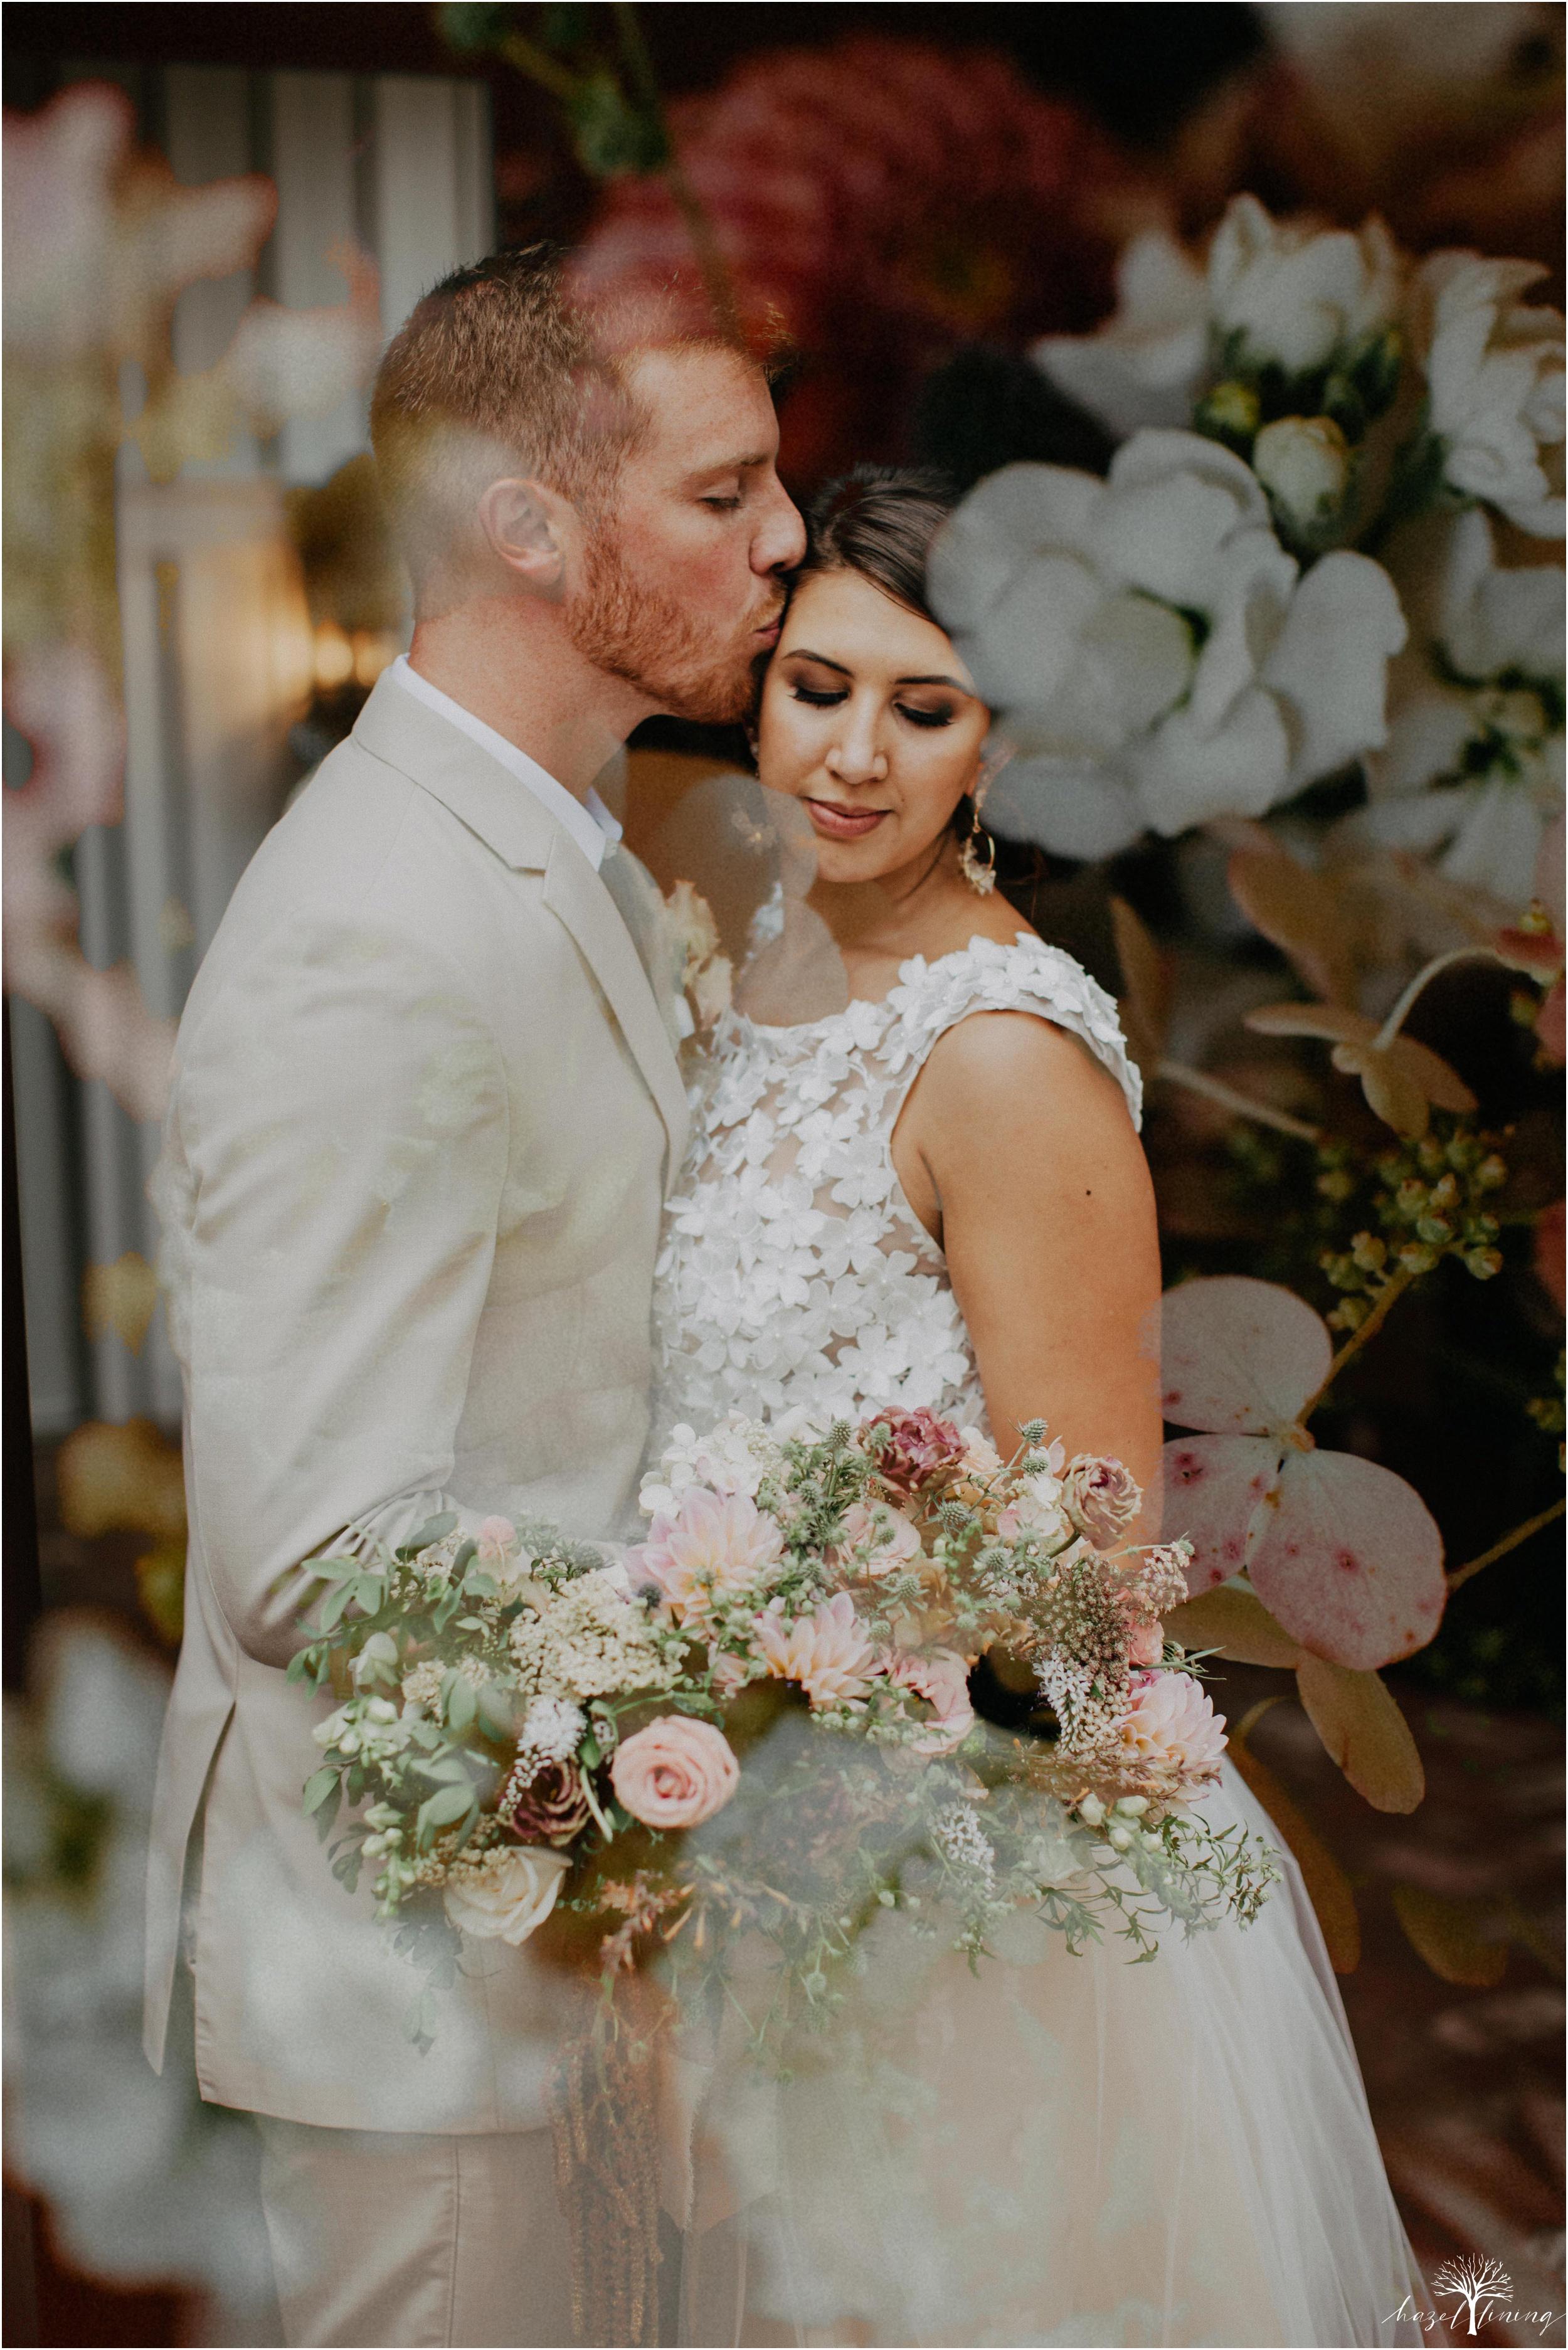 carl-chloe-the-ryland-inn-whitehouse-station-new-jersey-styled-squad-hazel-lining-photography-destination-elopement-wedding-engagement-photography_0023.jpg